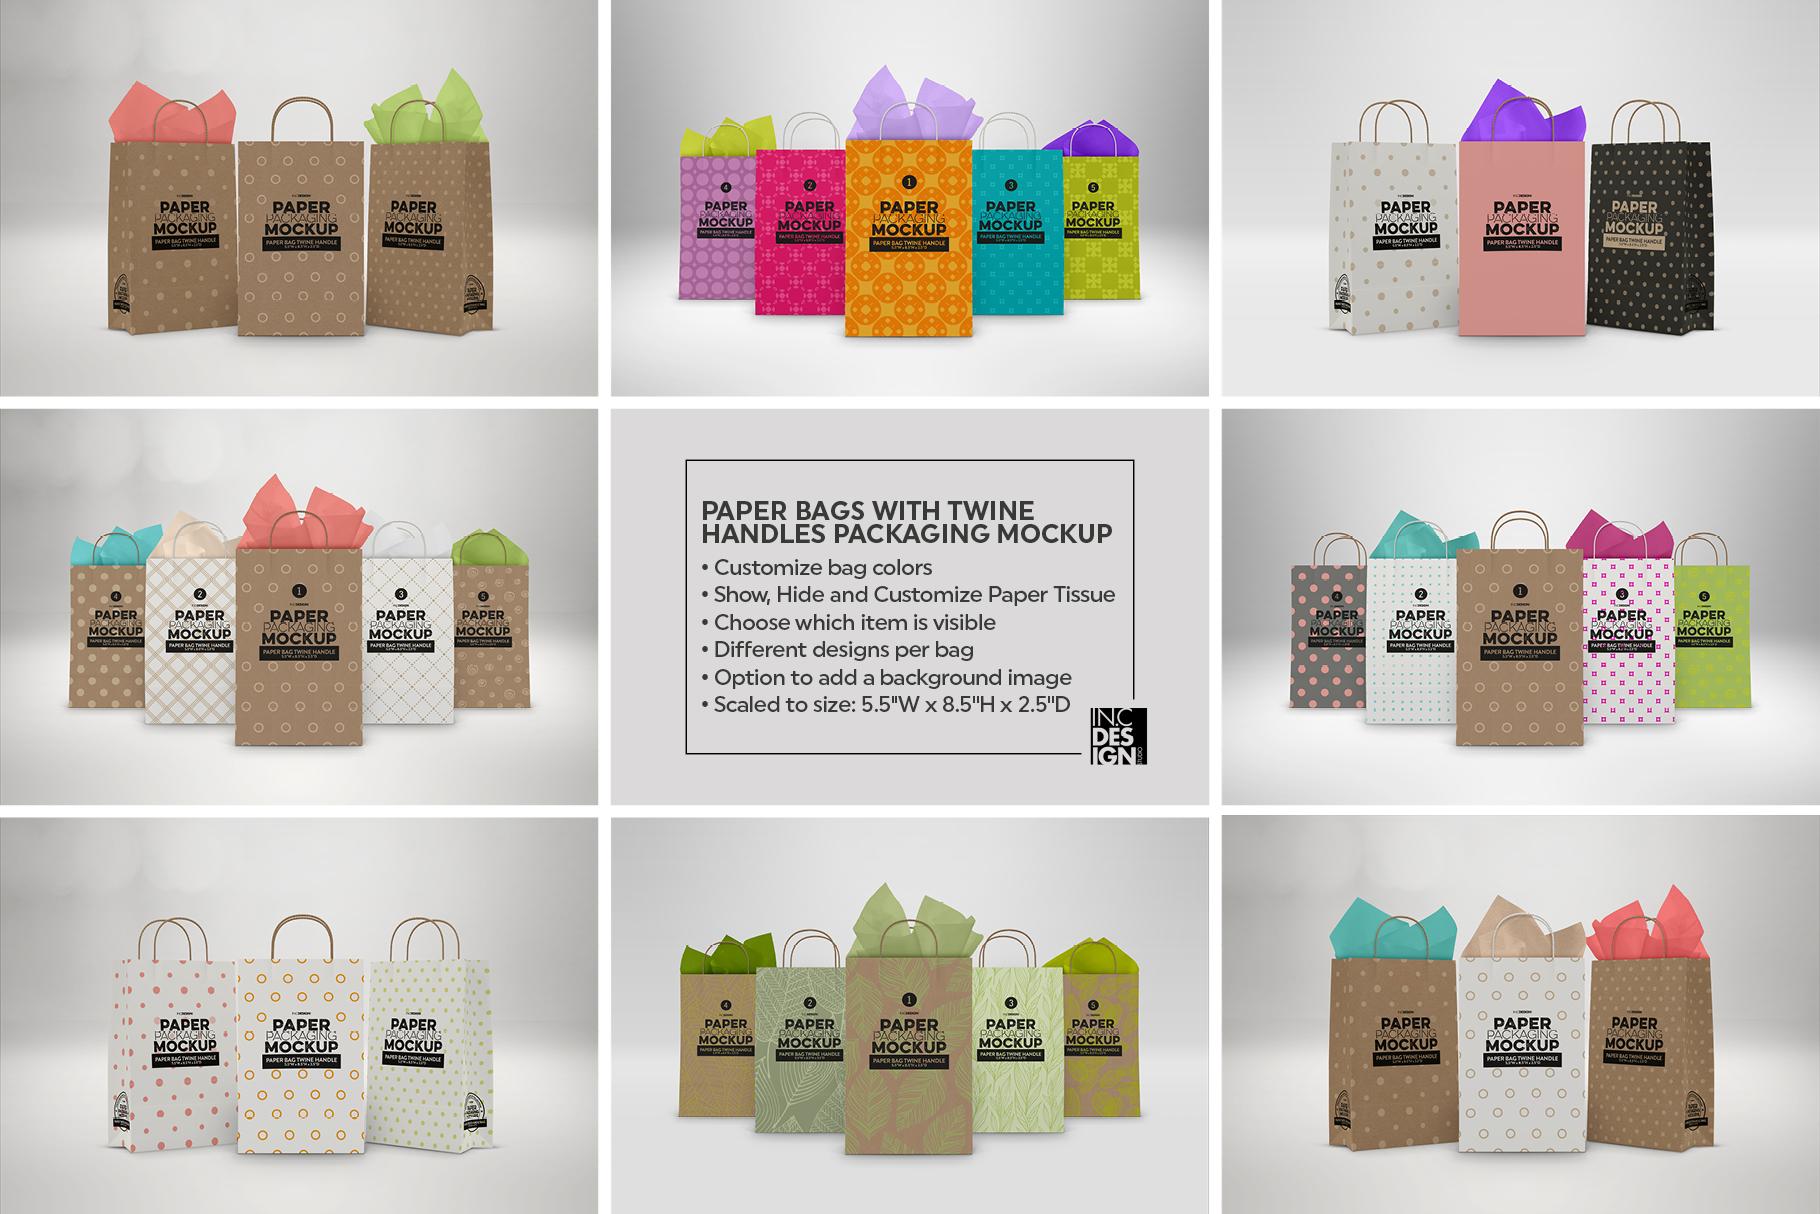 VOL. 17 Paper Box Packaging Mockups example image 6